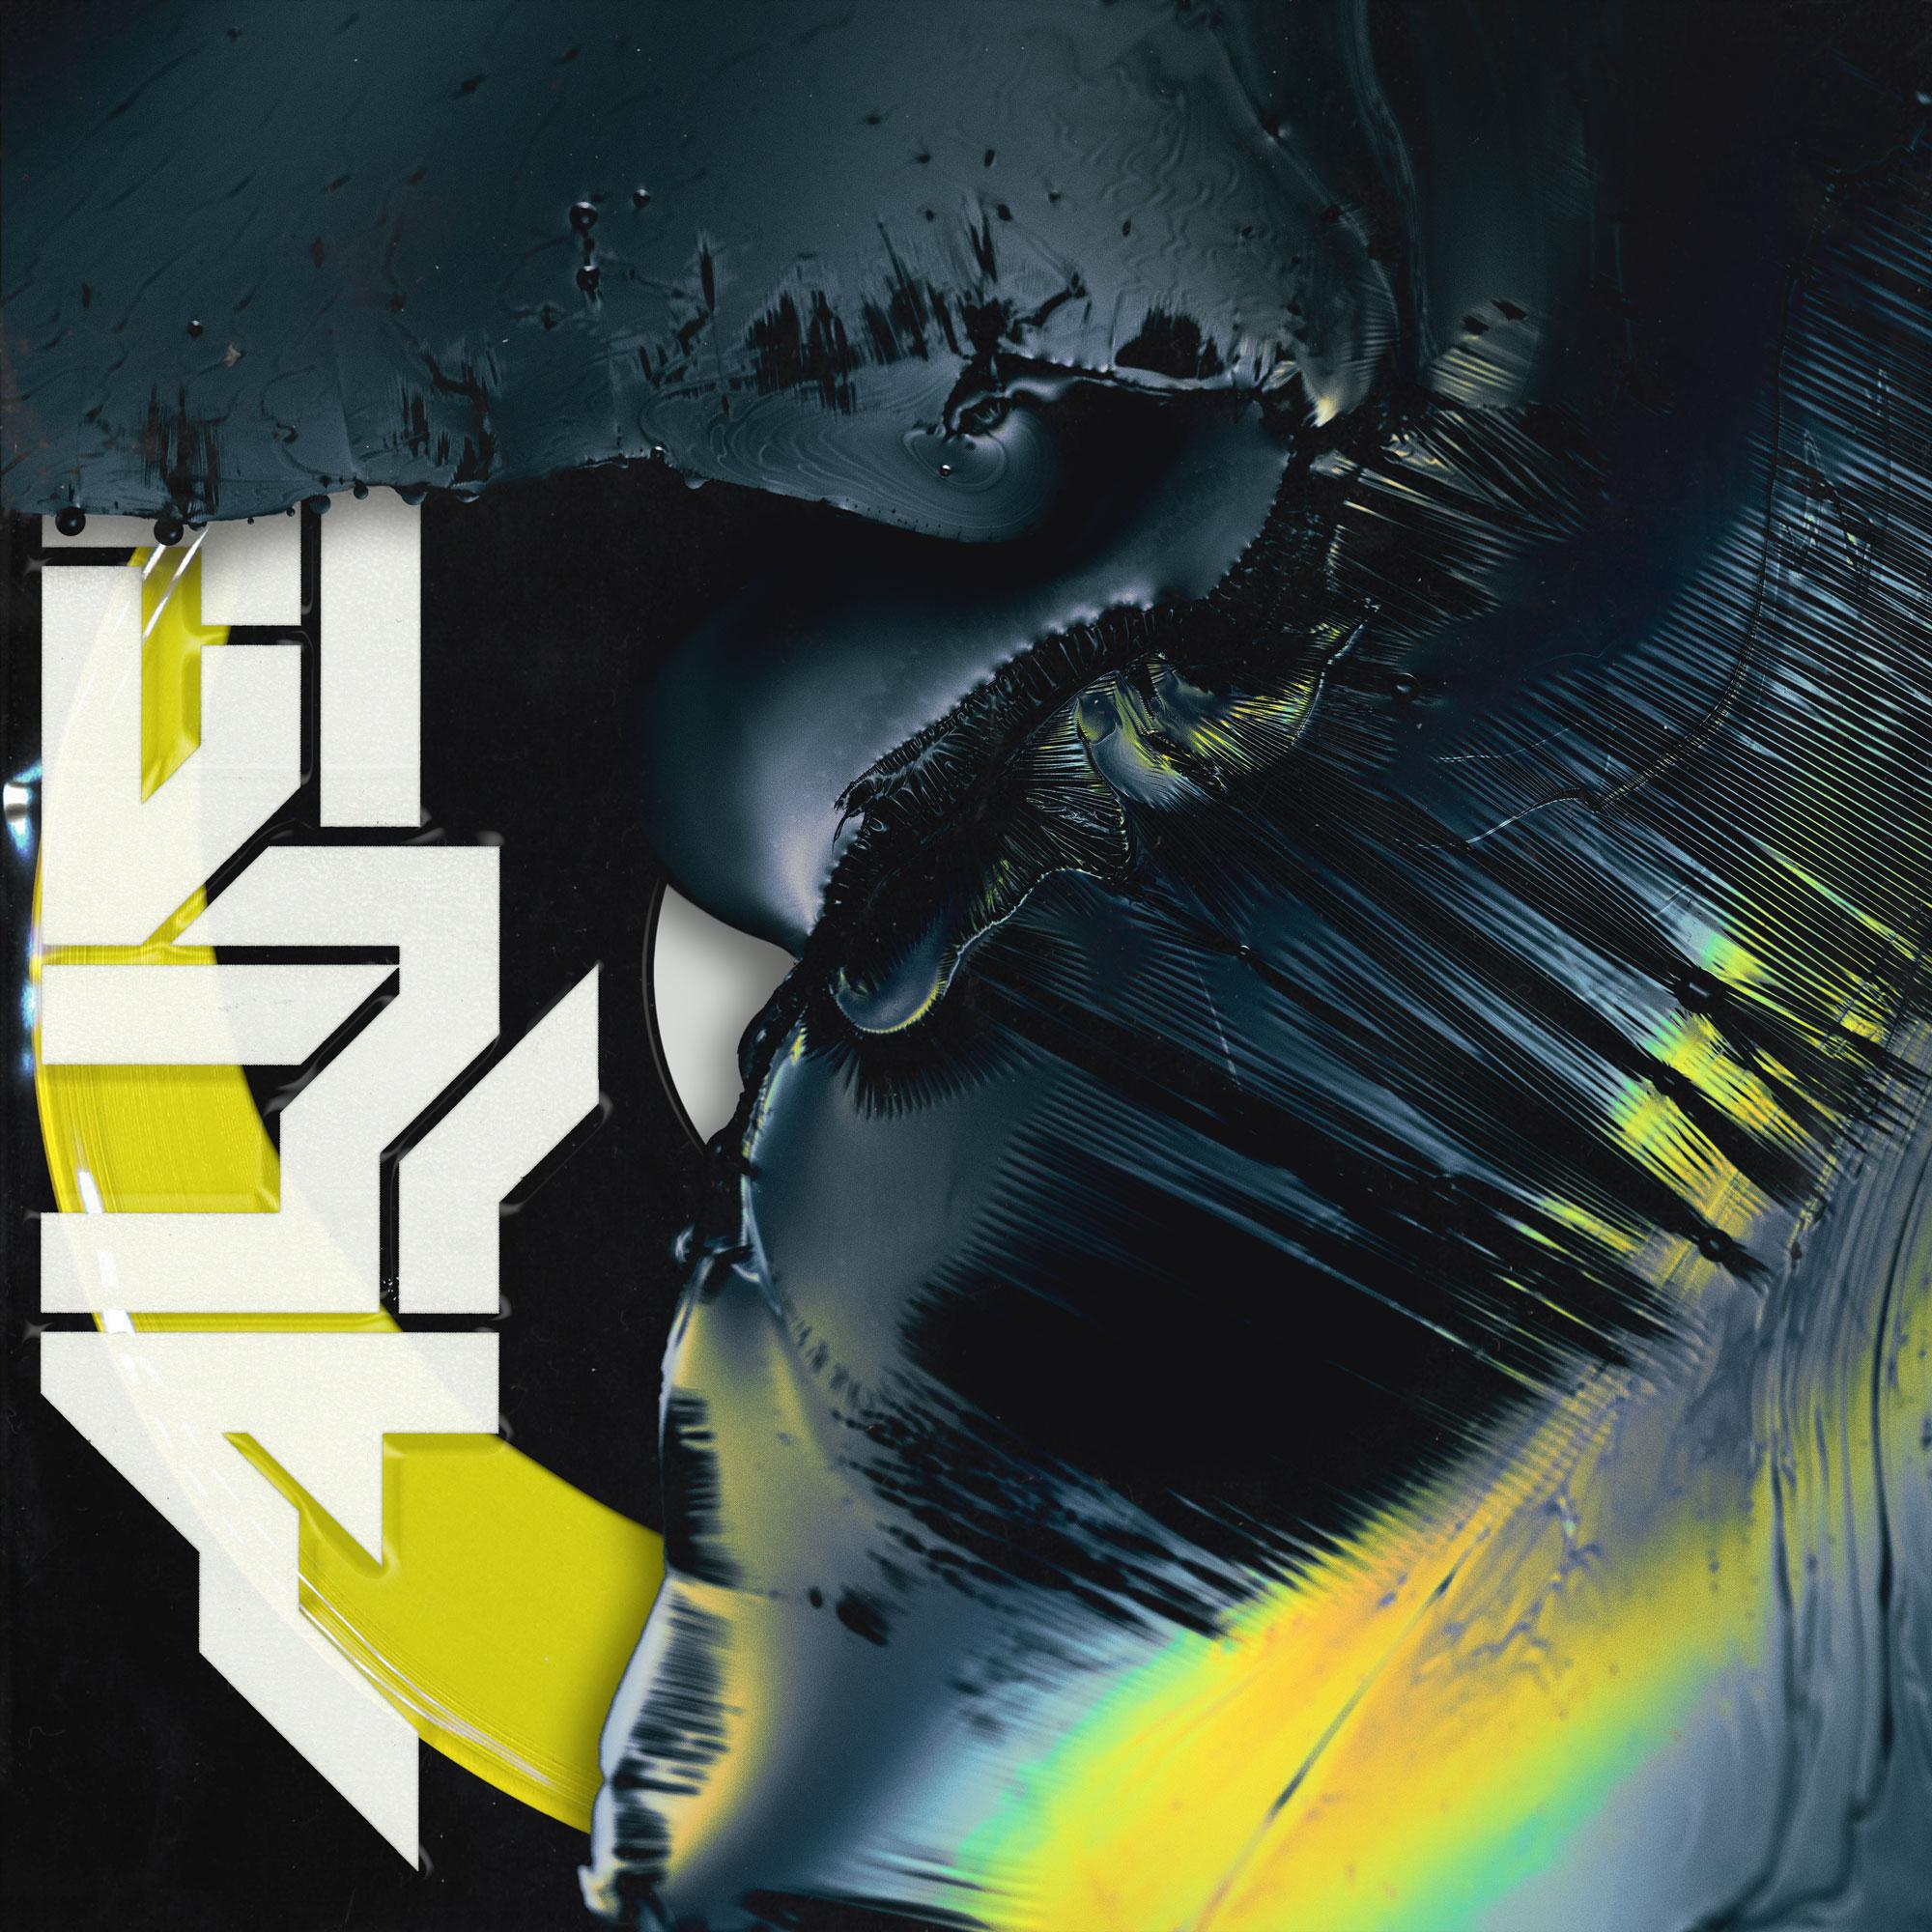 northlane-alien-der-metalcore-cocktail-album-review